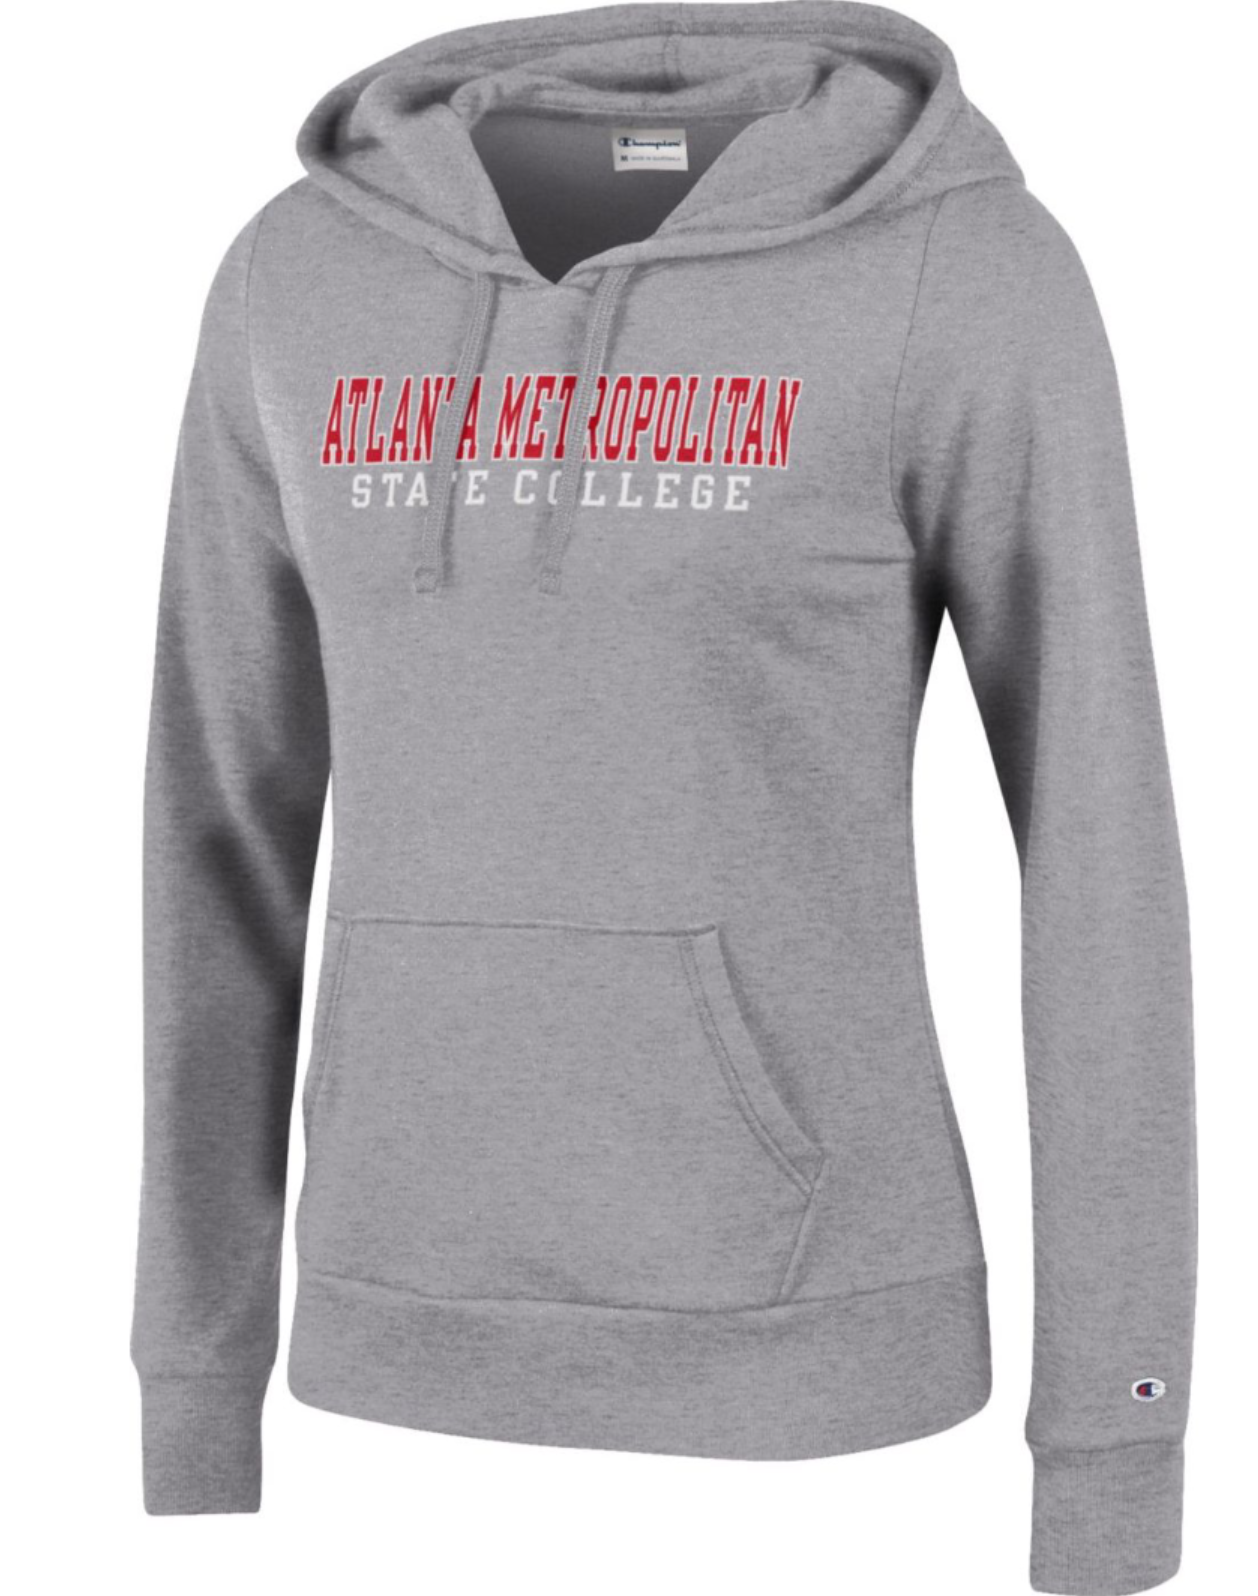 Atlanta Metropolitan State College Women's Hooded Sweatshirt